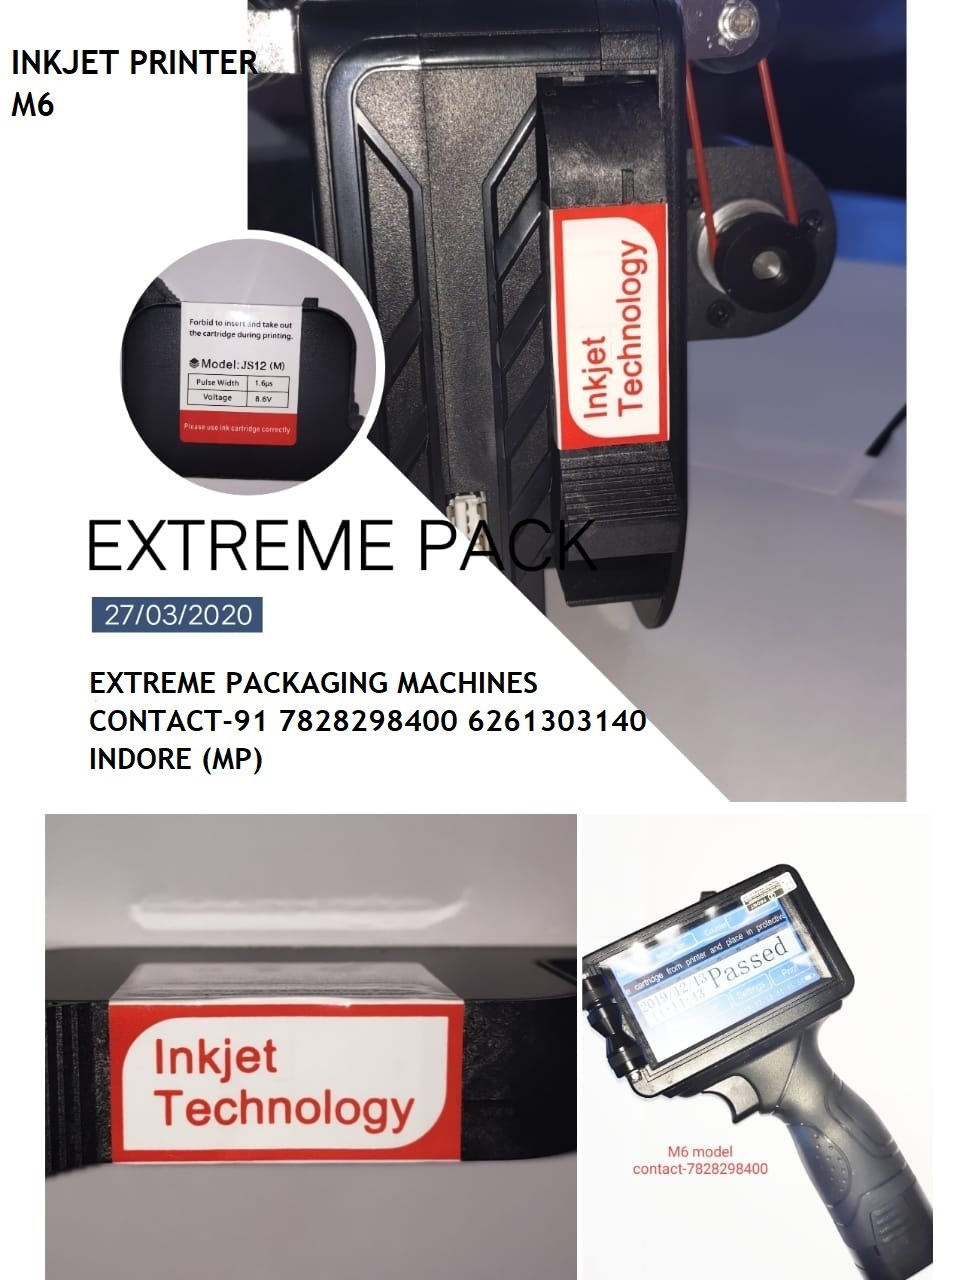 High Resolution Handy Inkjet Printer Machine